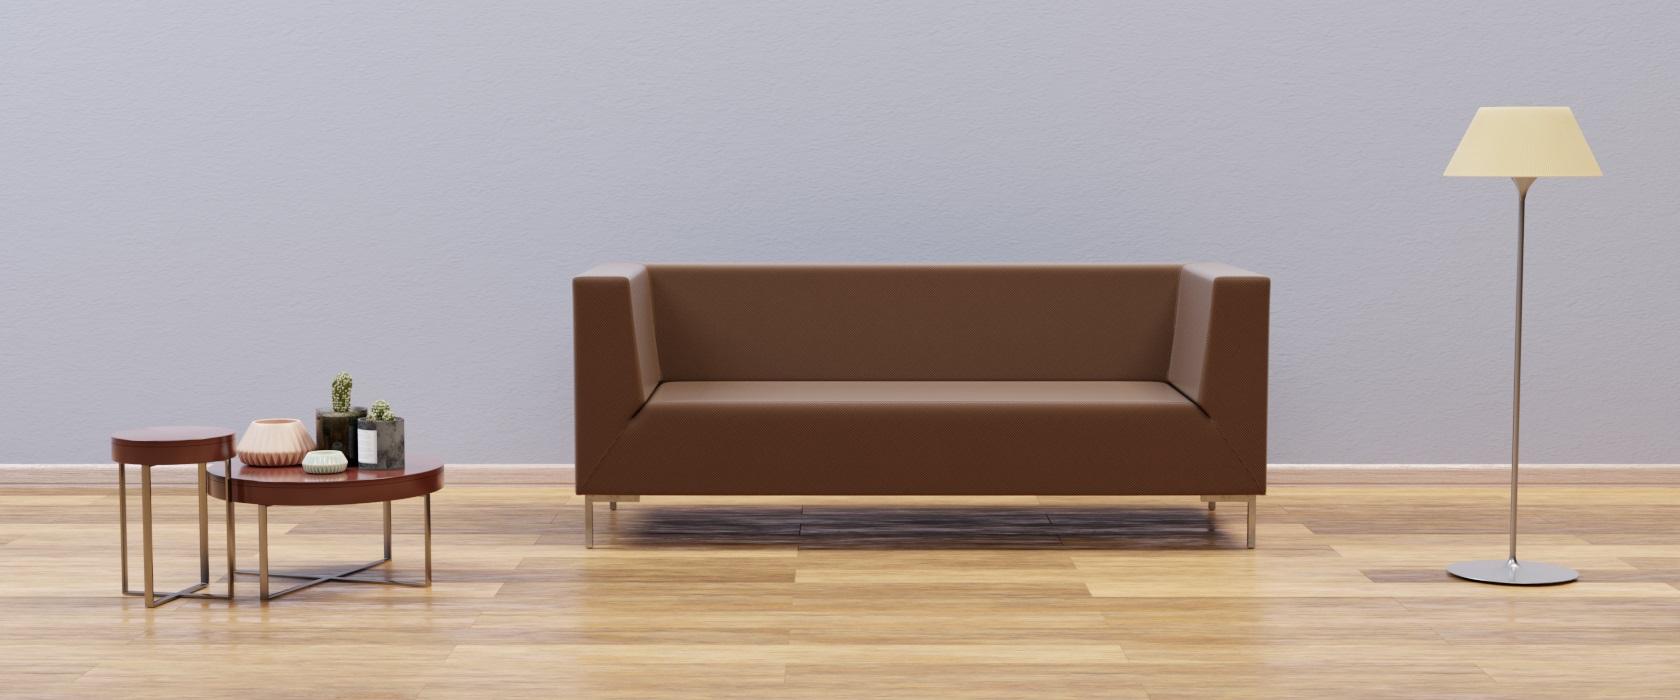 Двухместный диван Livorno Club - Фото 2 - Pufetto